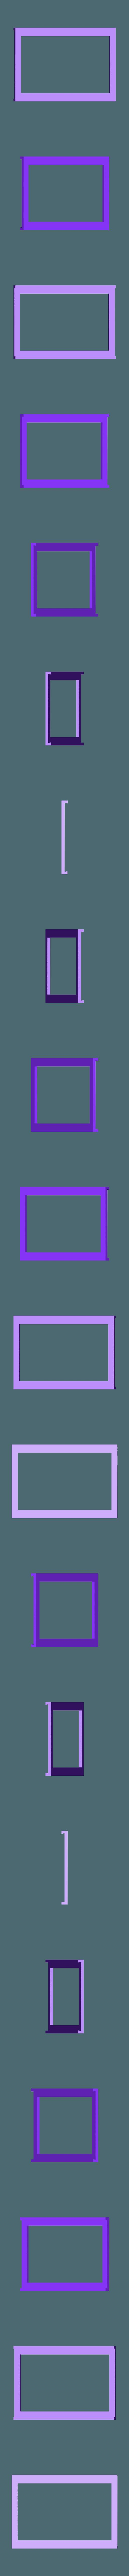 lid.stl Download free STL file Magnet Thermal Picture Frame • 3D print model, fotorius